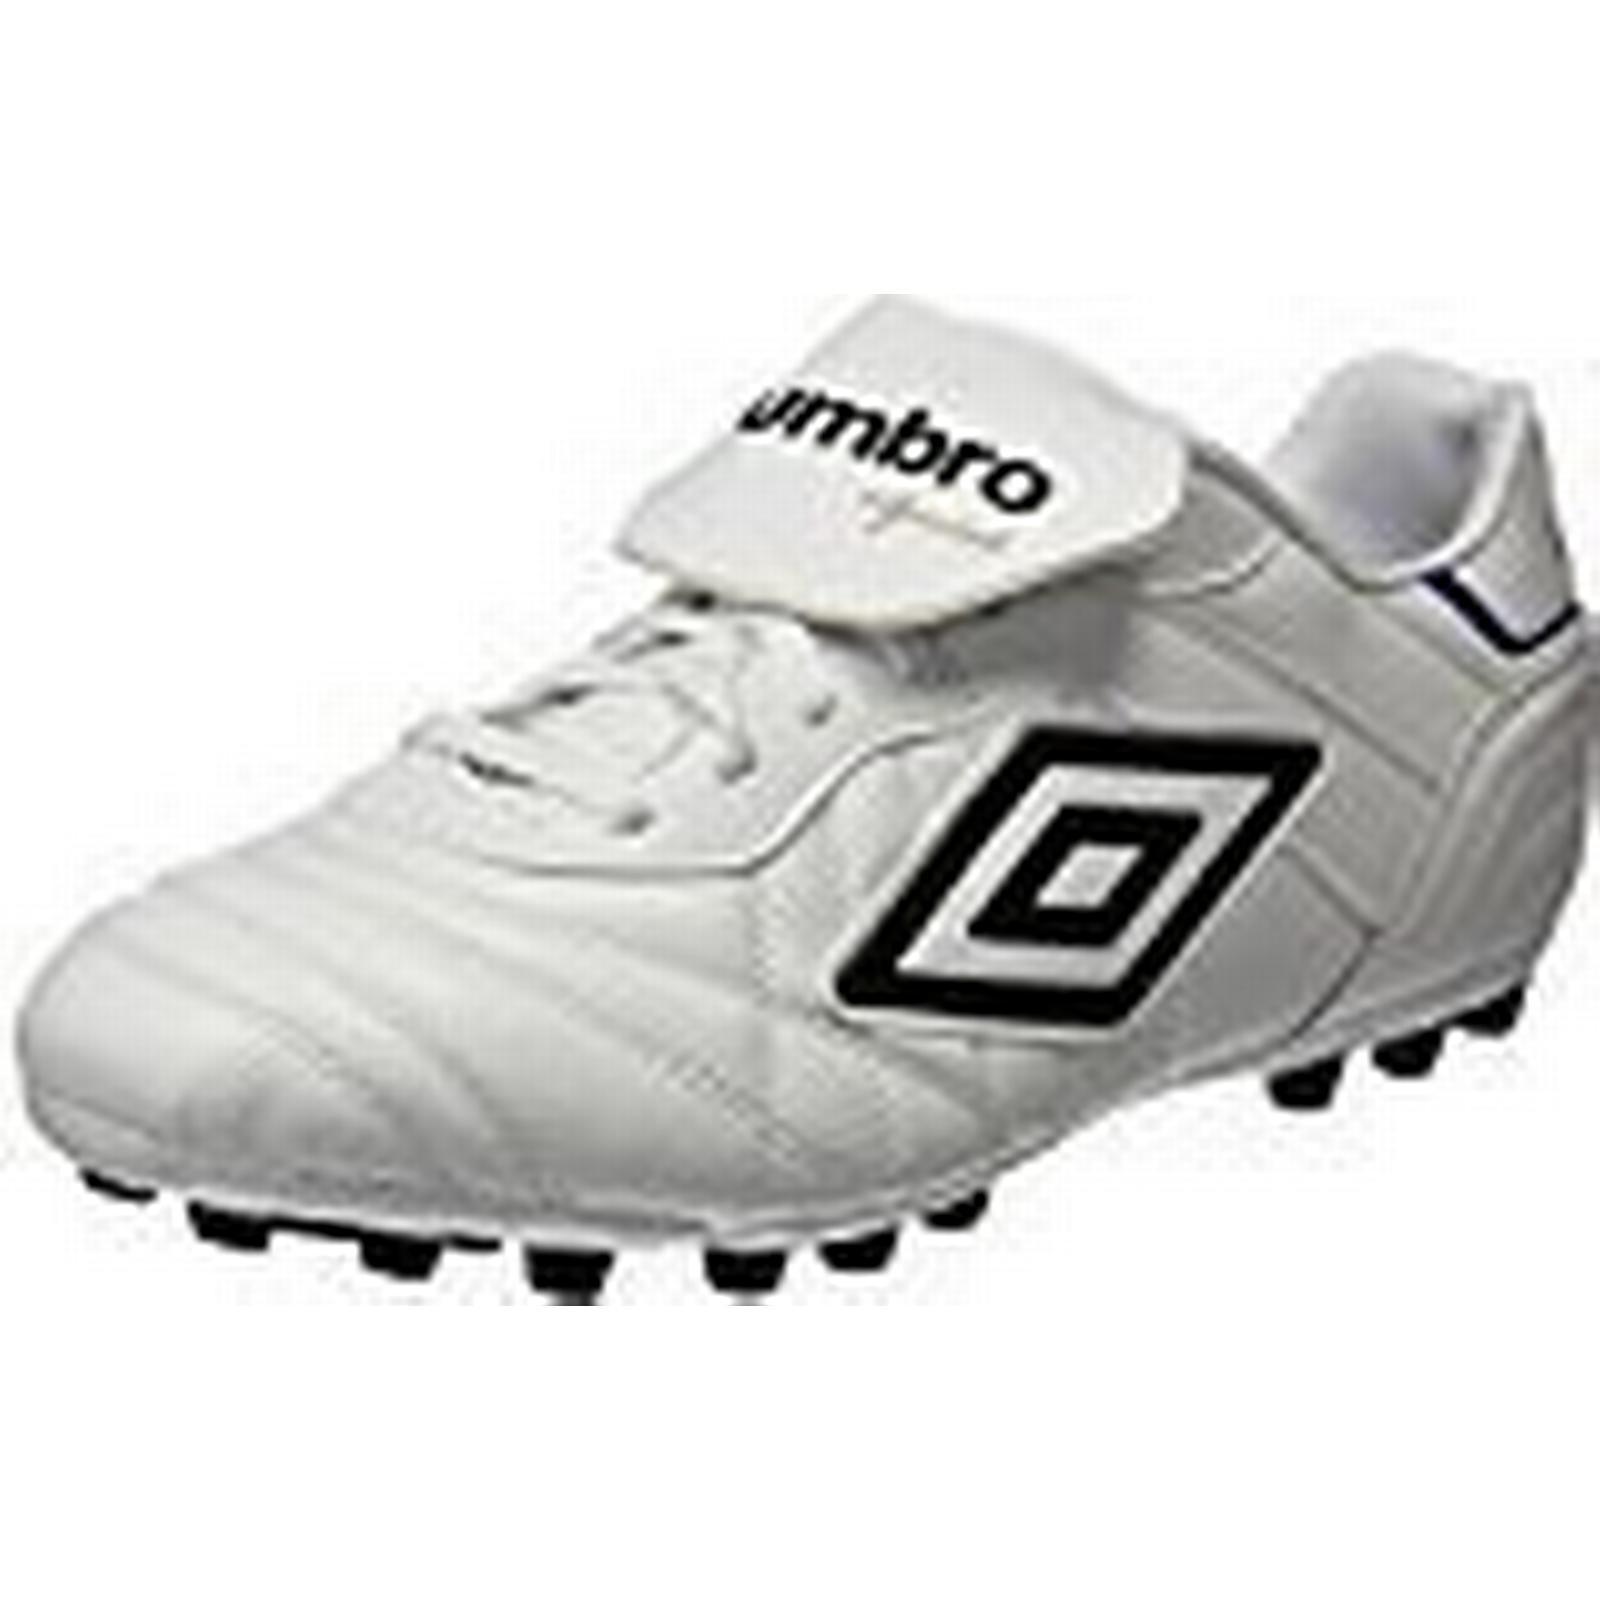 Umbro Speciali Football Eternal Premier Ag, Men's Football Speciali Shoes, White (Blanco/Negro/Clematis Azul), 6.5 UK (40.5 EU) 37ee7c